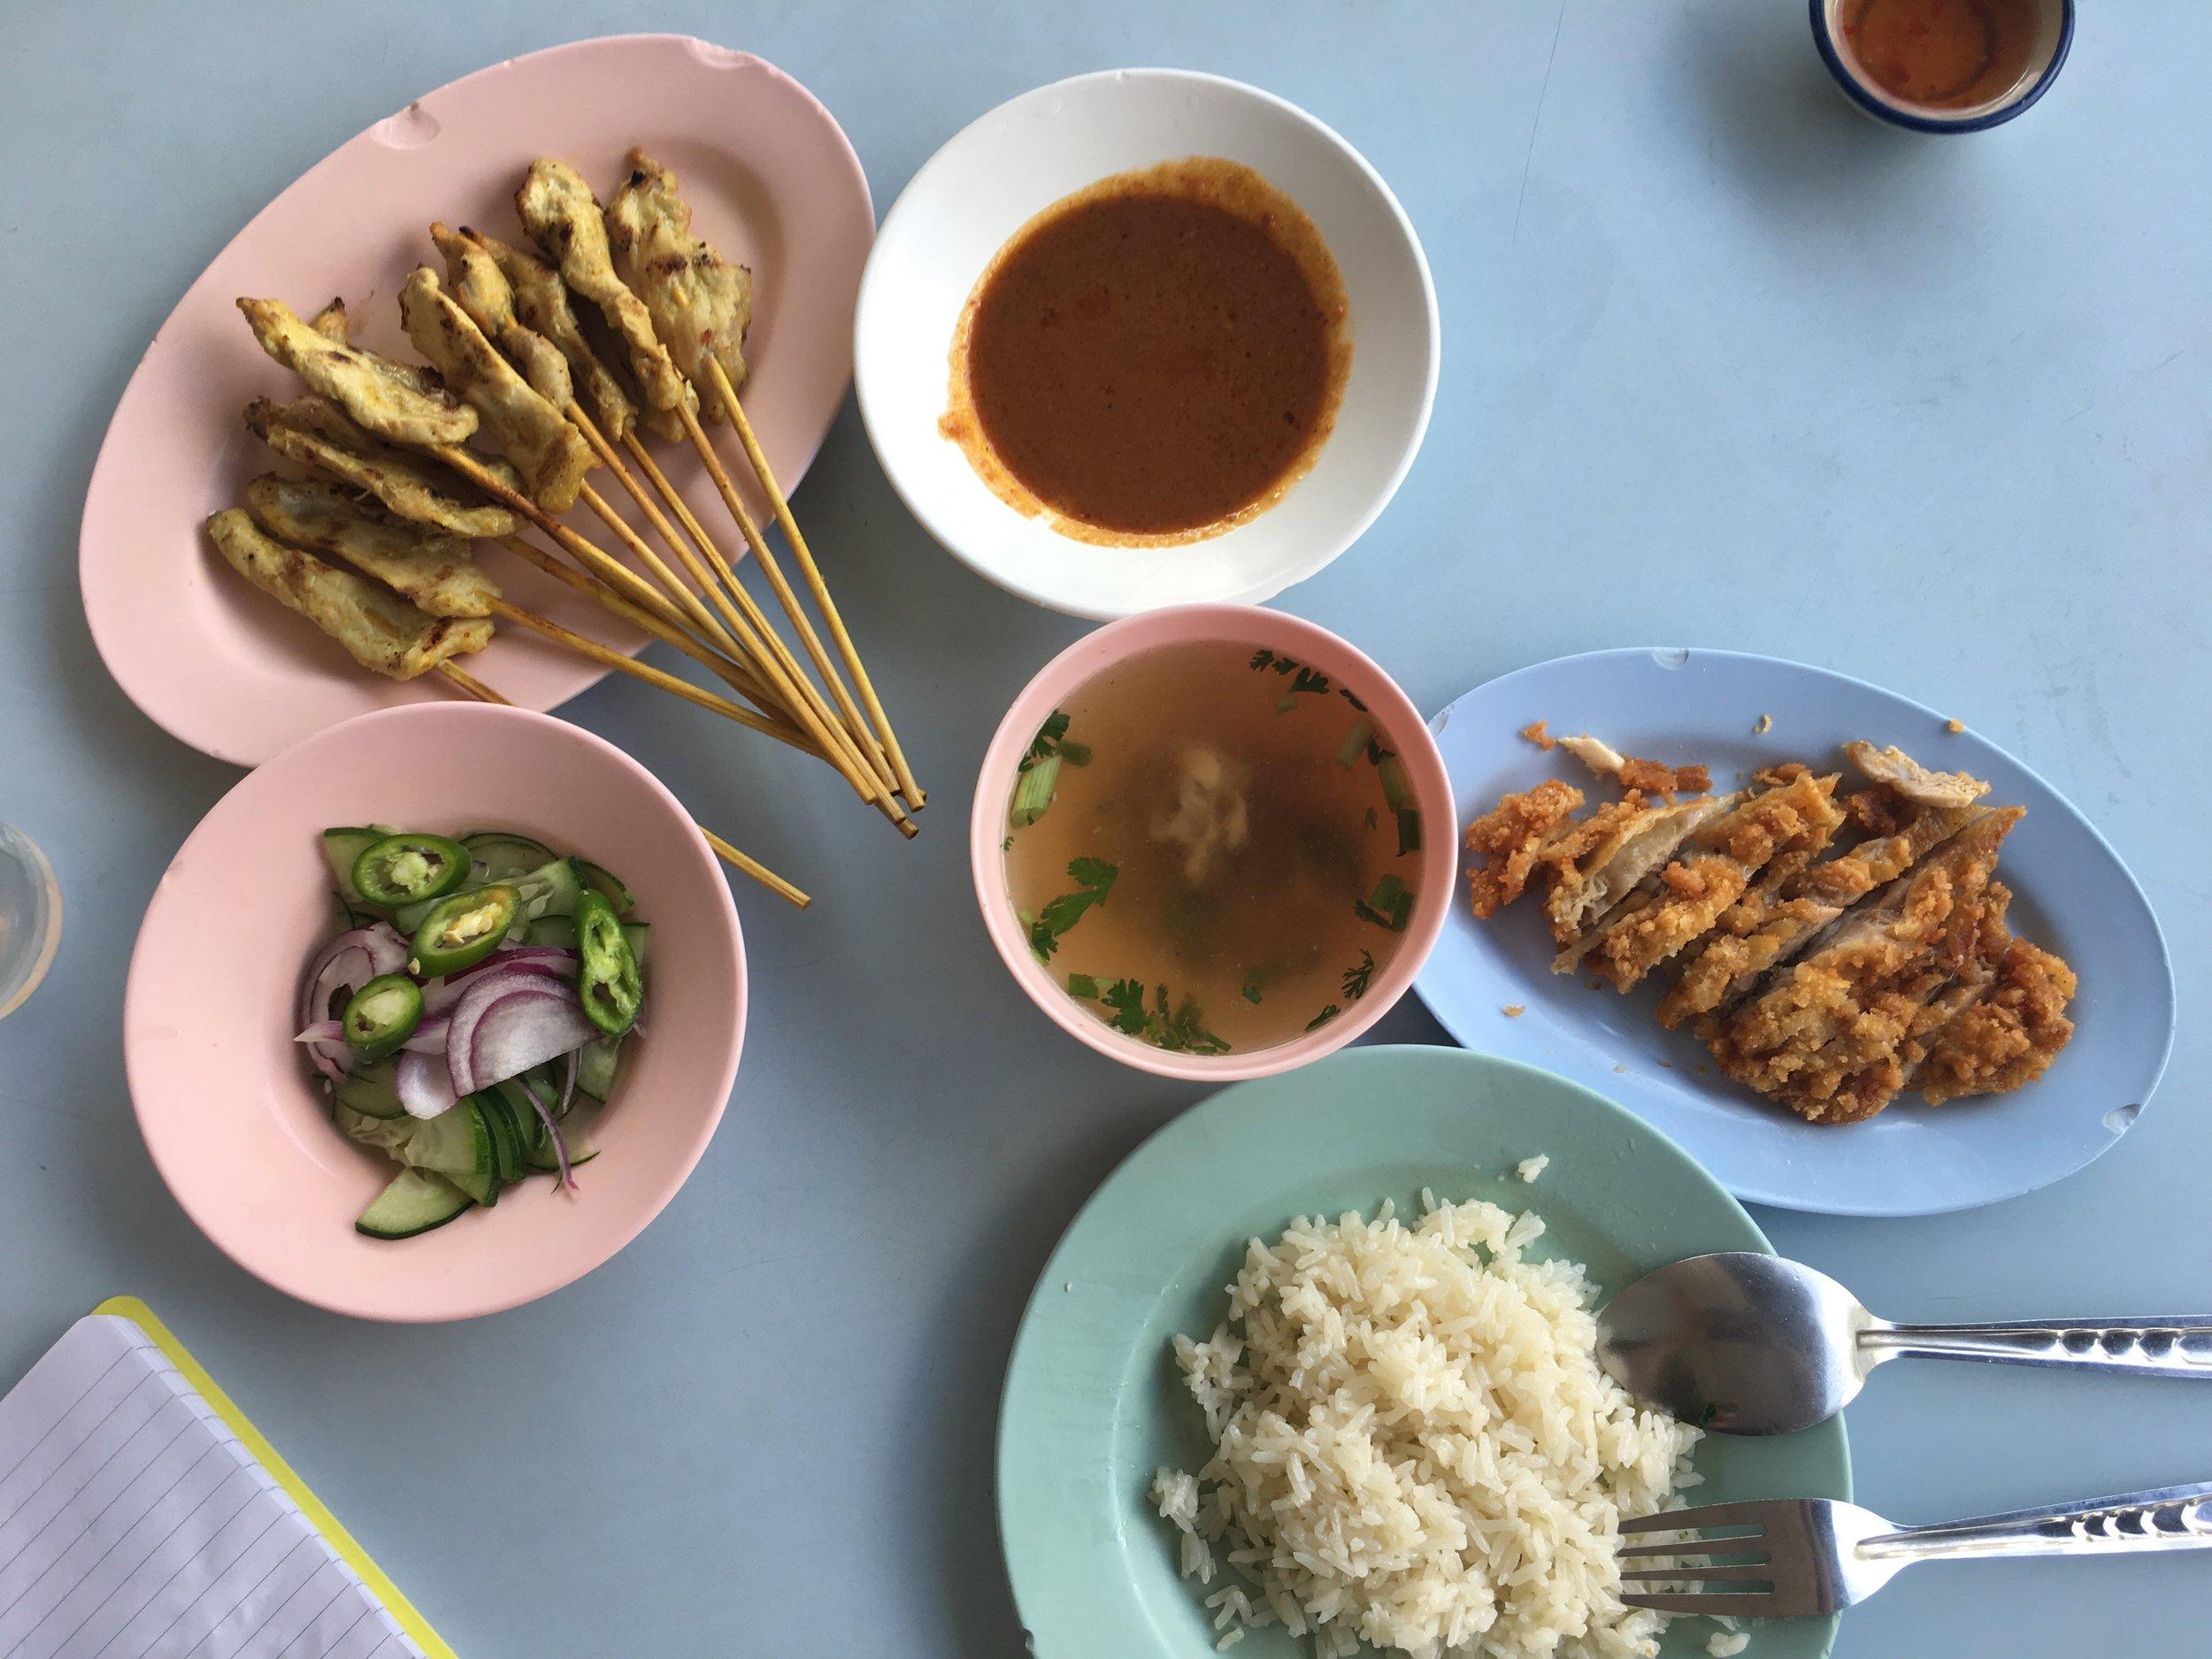 Pork satay, crispy chicken with sweet chilli sauce, steamed rice, chicken/pork broth & pickled cucumber salad